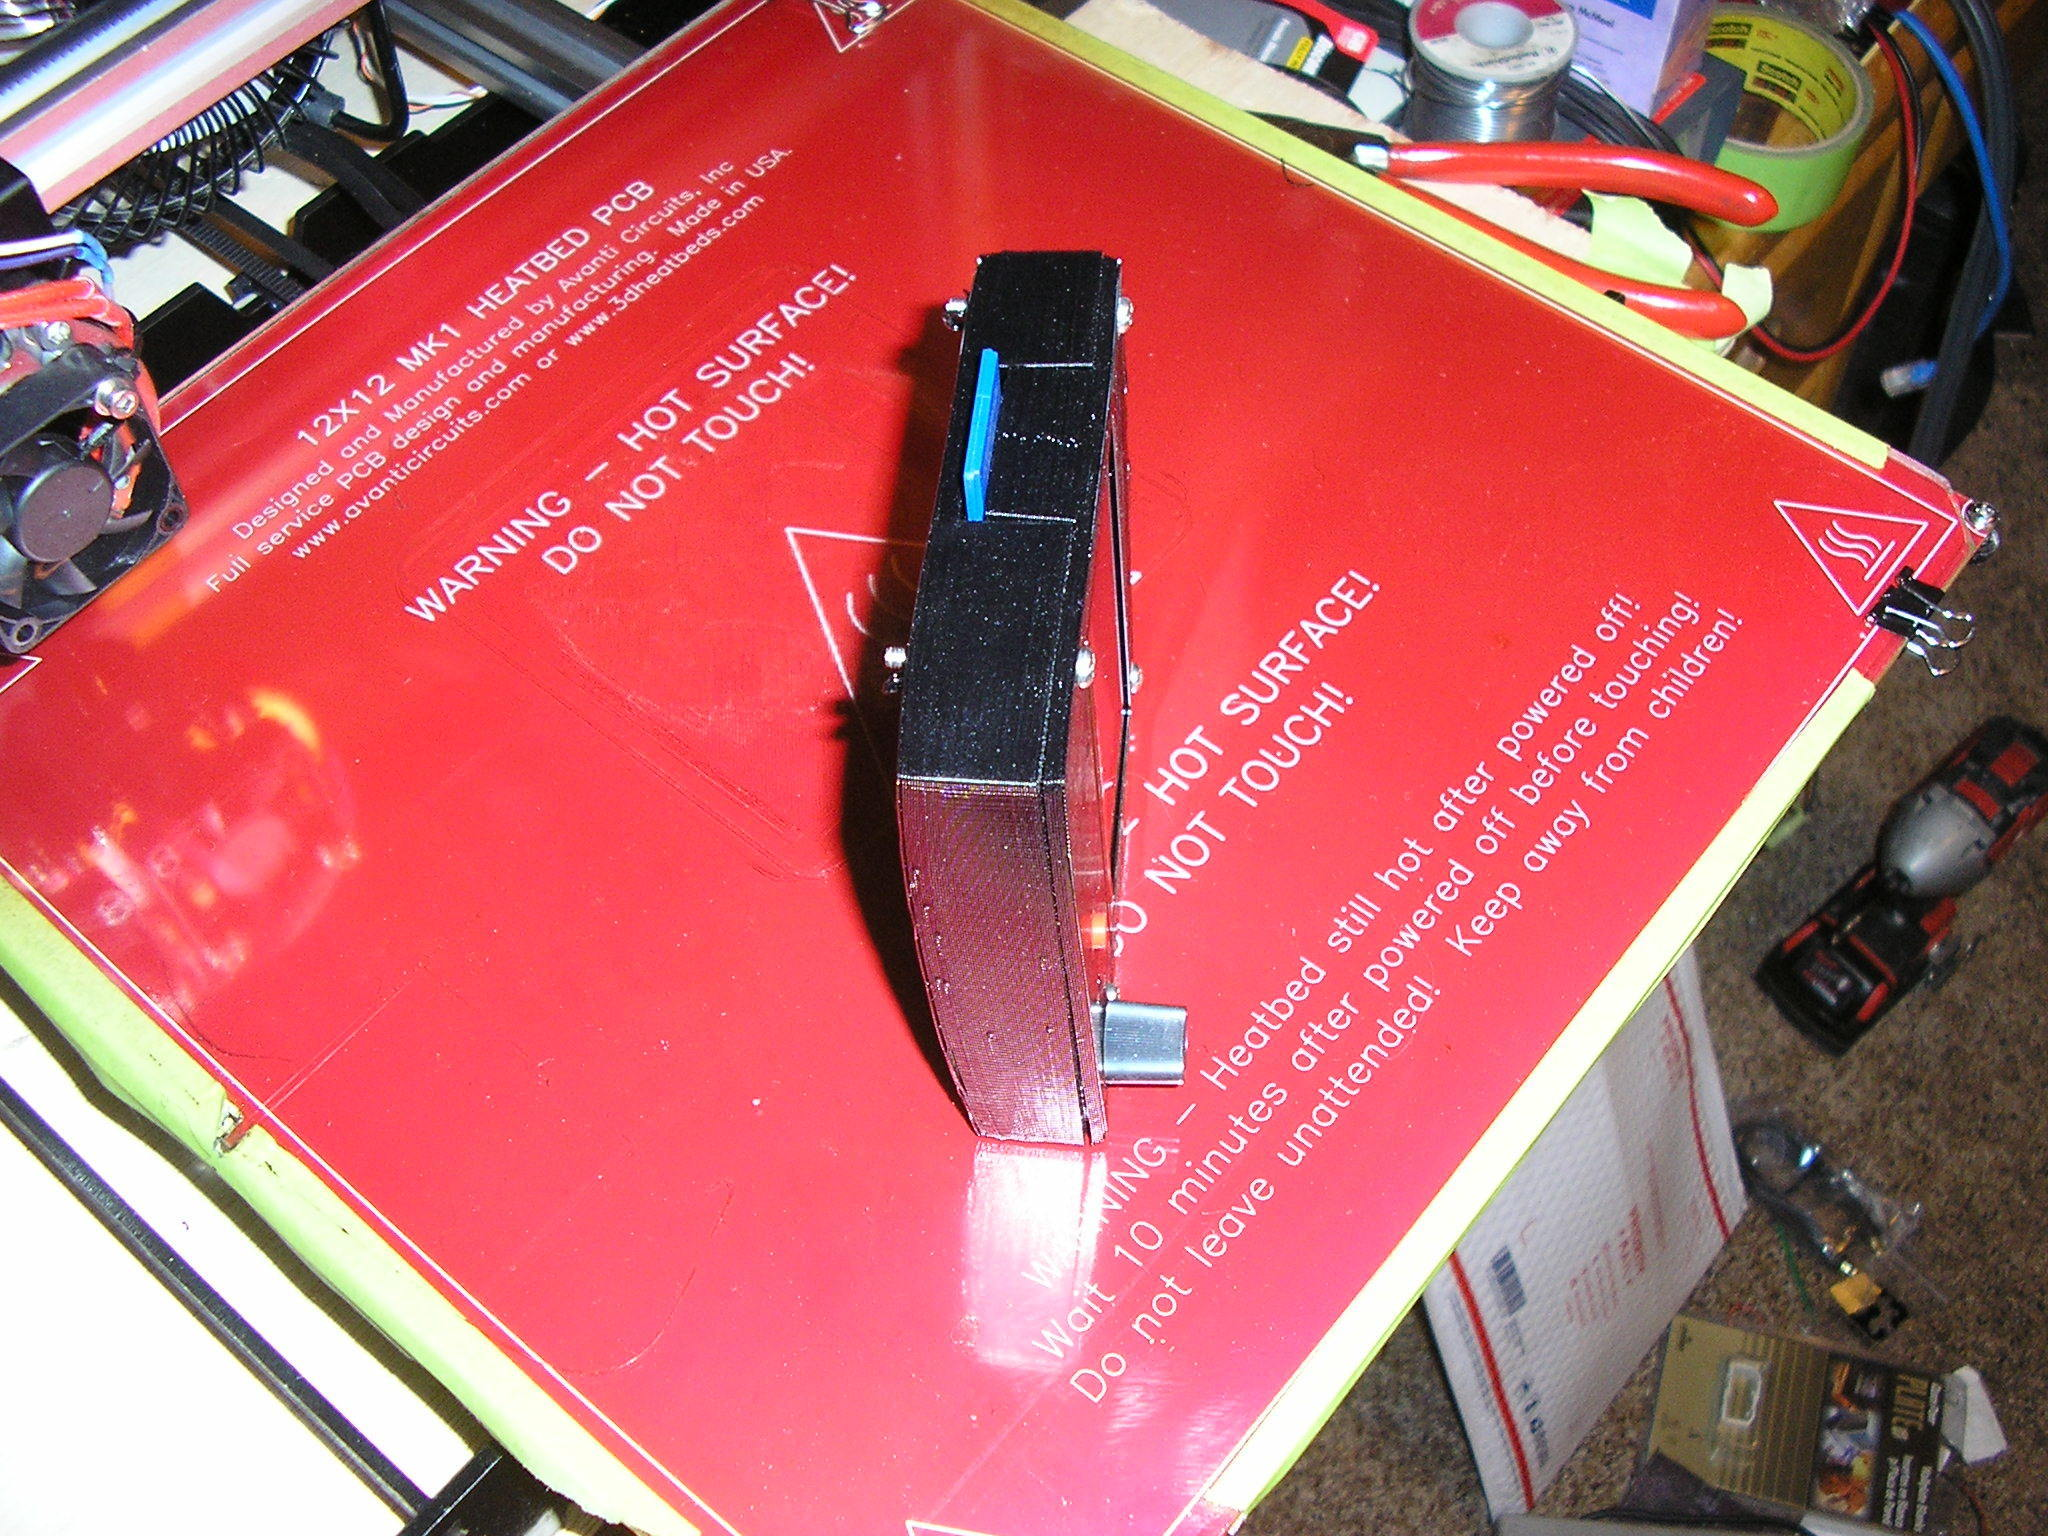 P1010026__3_.JPG Download free STL file NCS P3-v Steel 12864 LCD housing with Mount • 3D printing design, trentjw